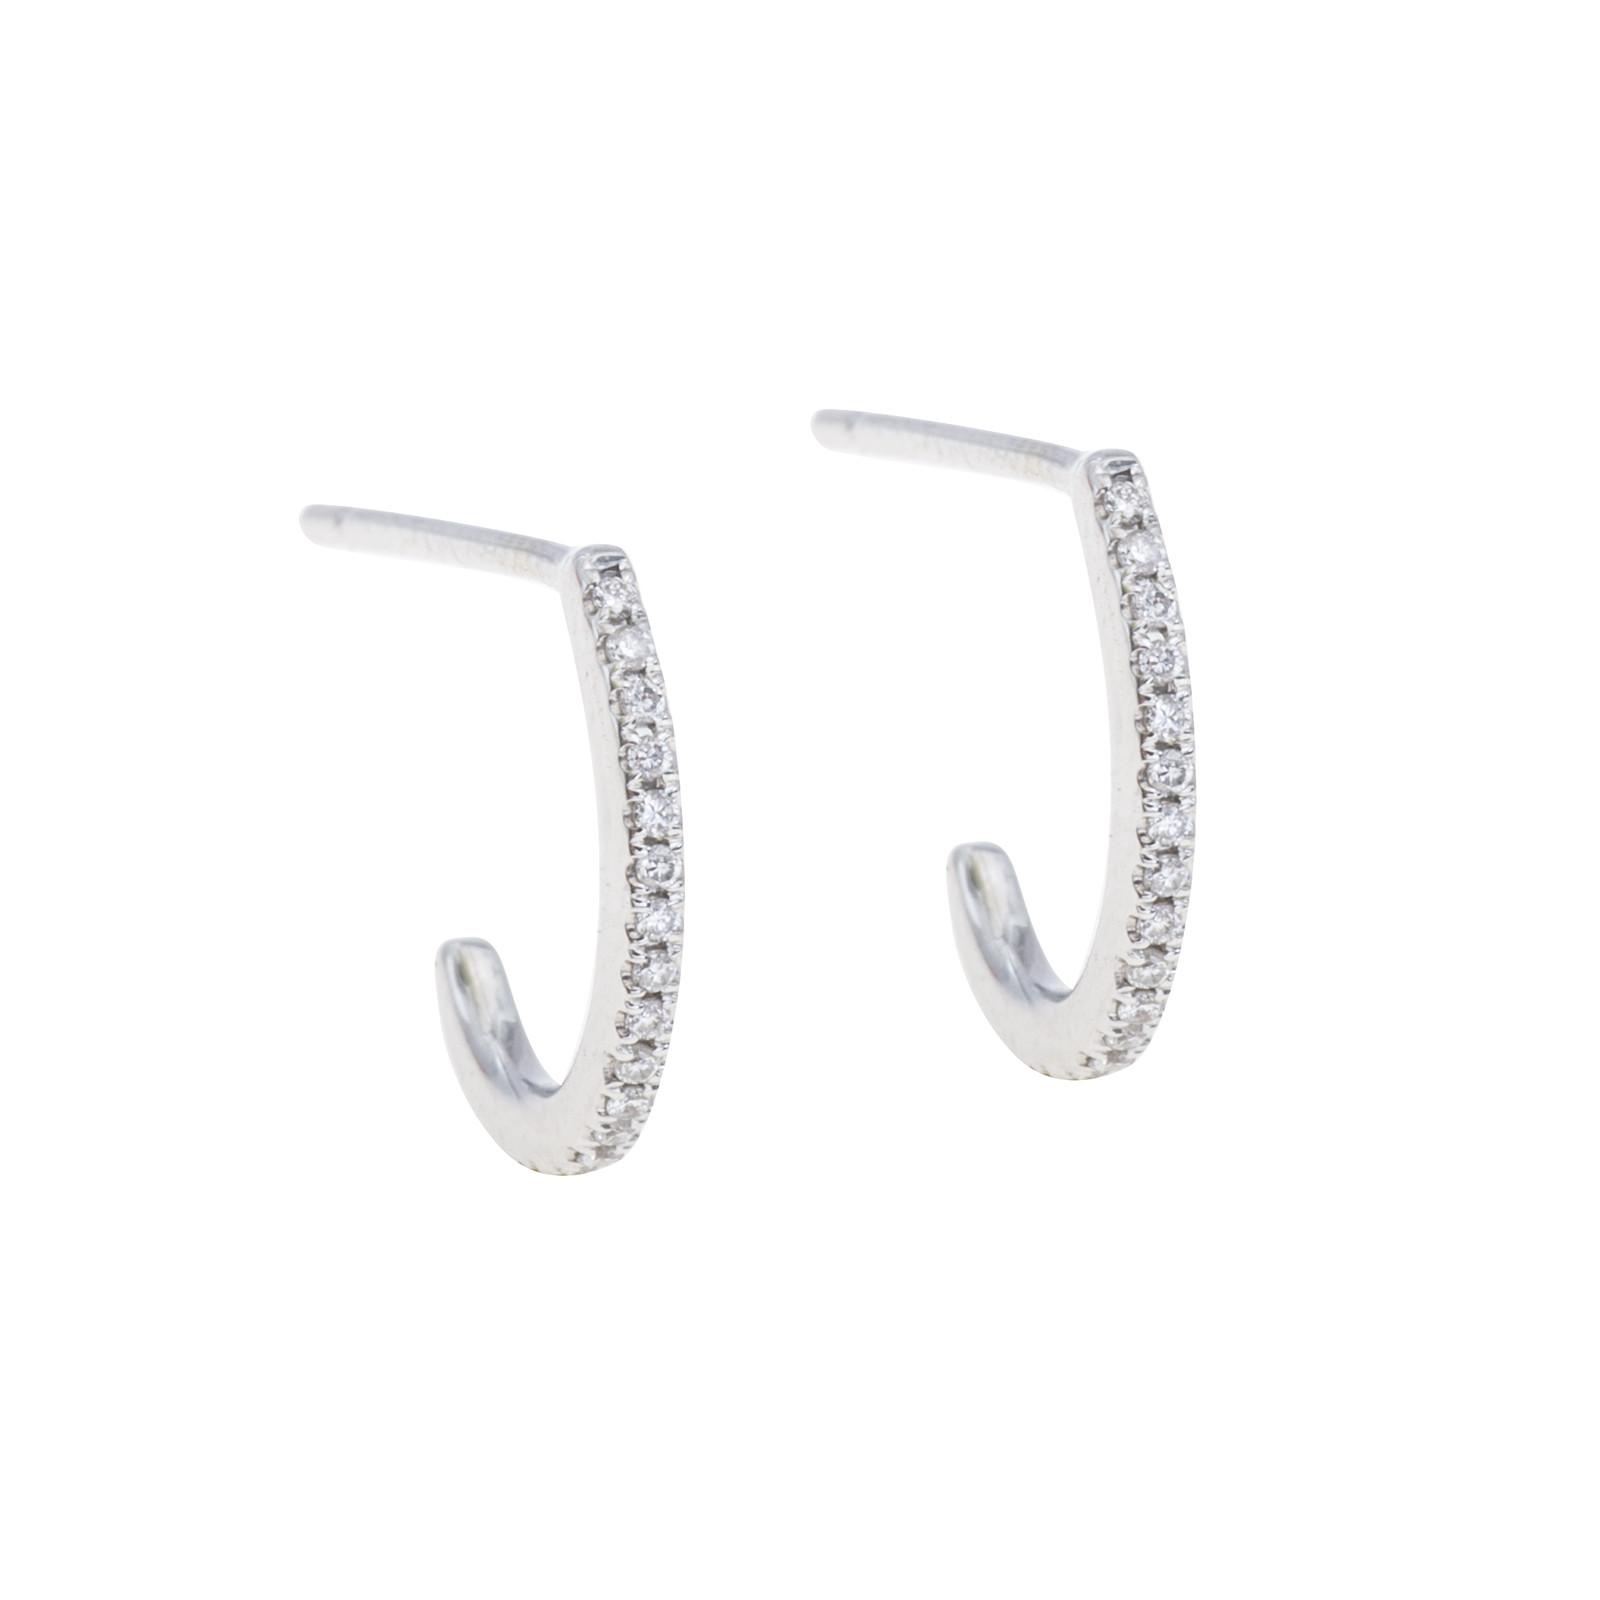 New Venetti 0.08 CTW Diamond Huggie Earrings